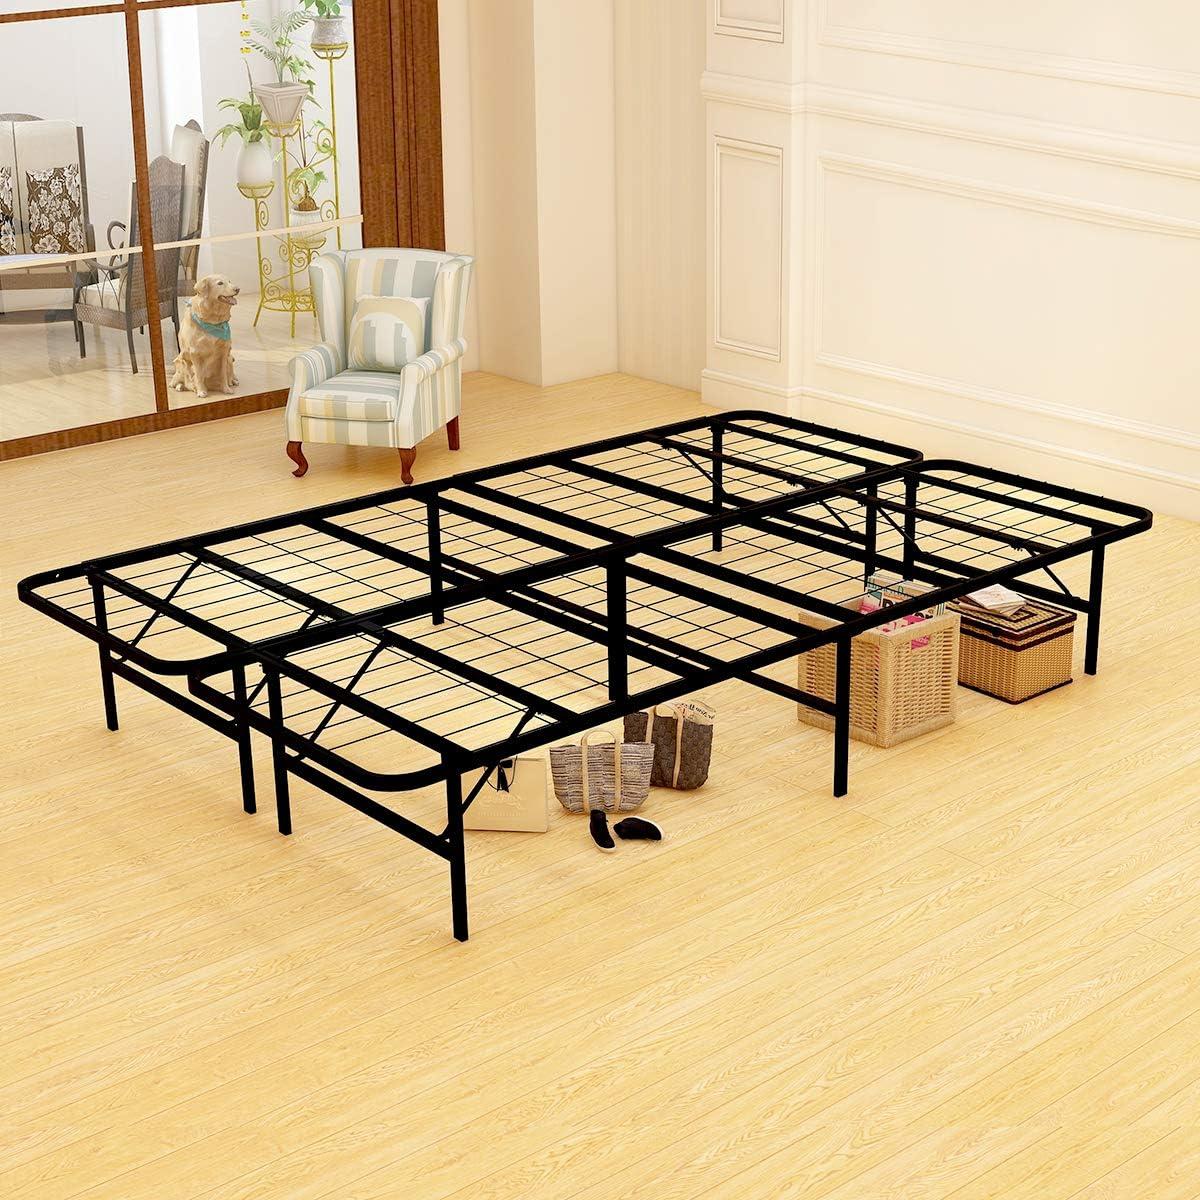 JURMERRY Platform Bed Frame, Metal Beds 14 Inch Box Spring Replacement Mattress Foundation Heavy Duty Steel Slat Black Full